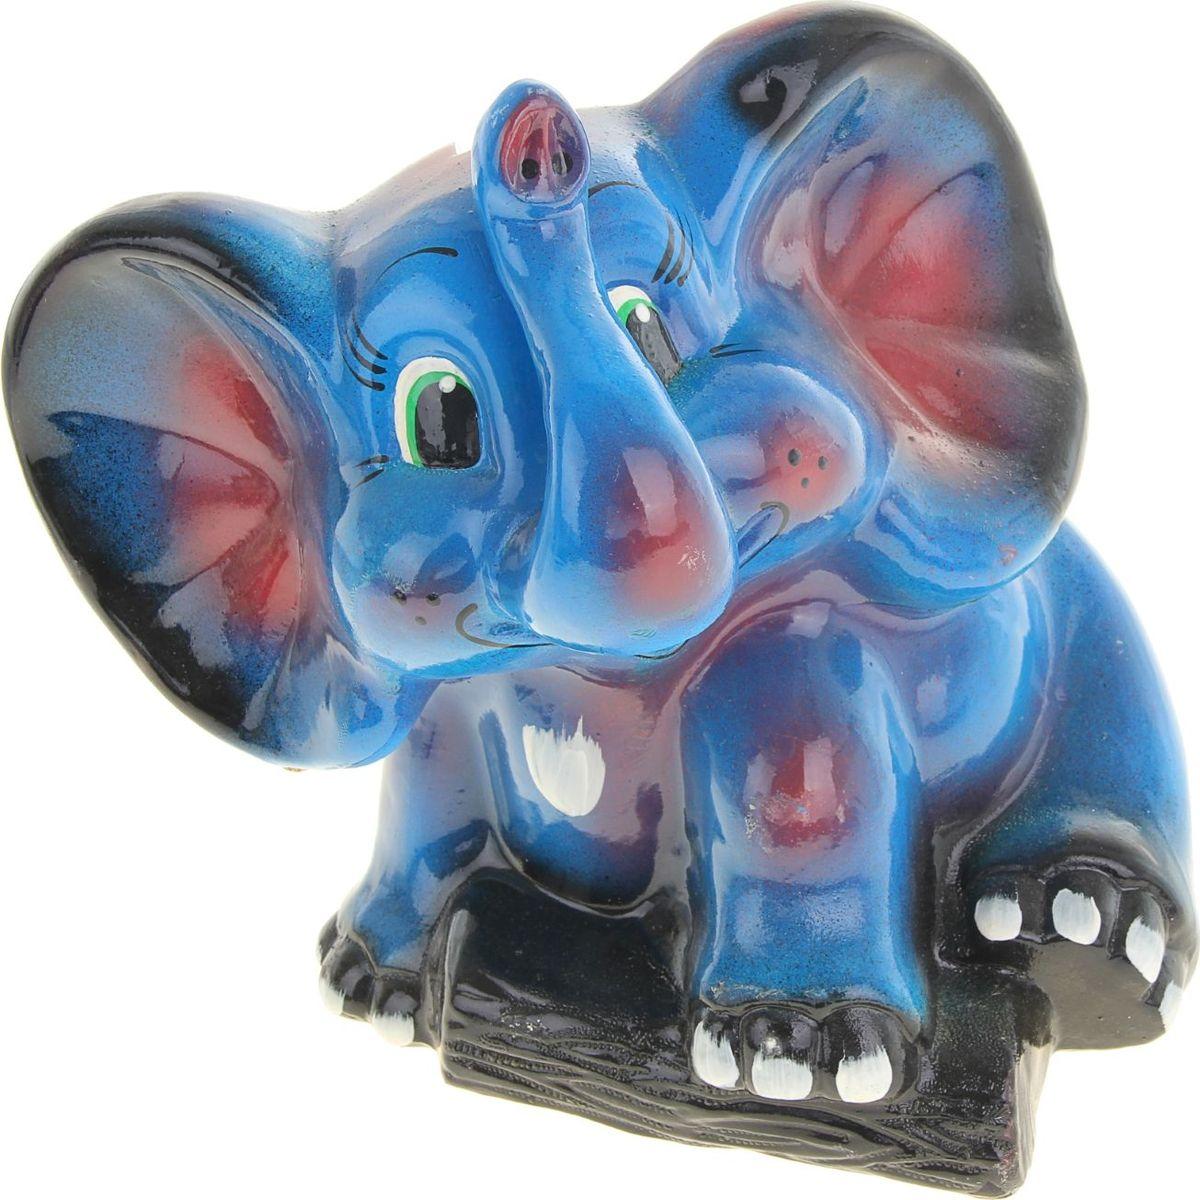 Копилка Керамика ручной работы Слон, 23 х 18 х 24 см копилка слон о бали